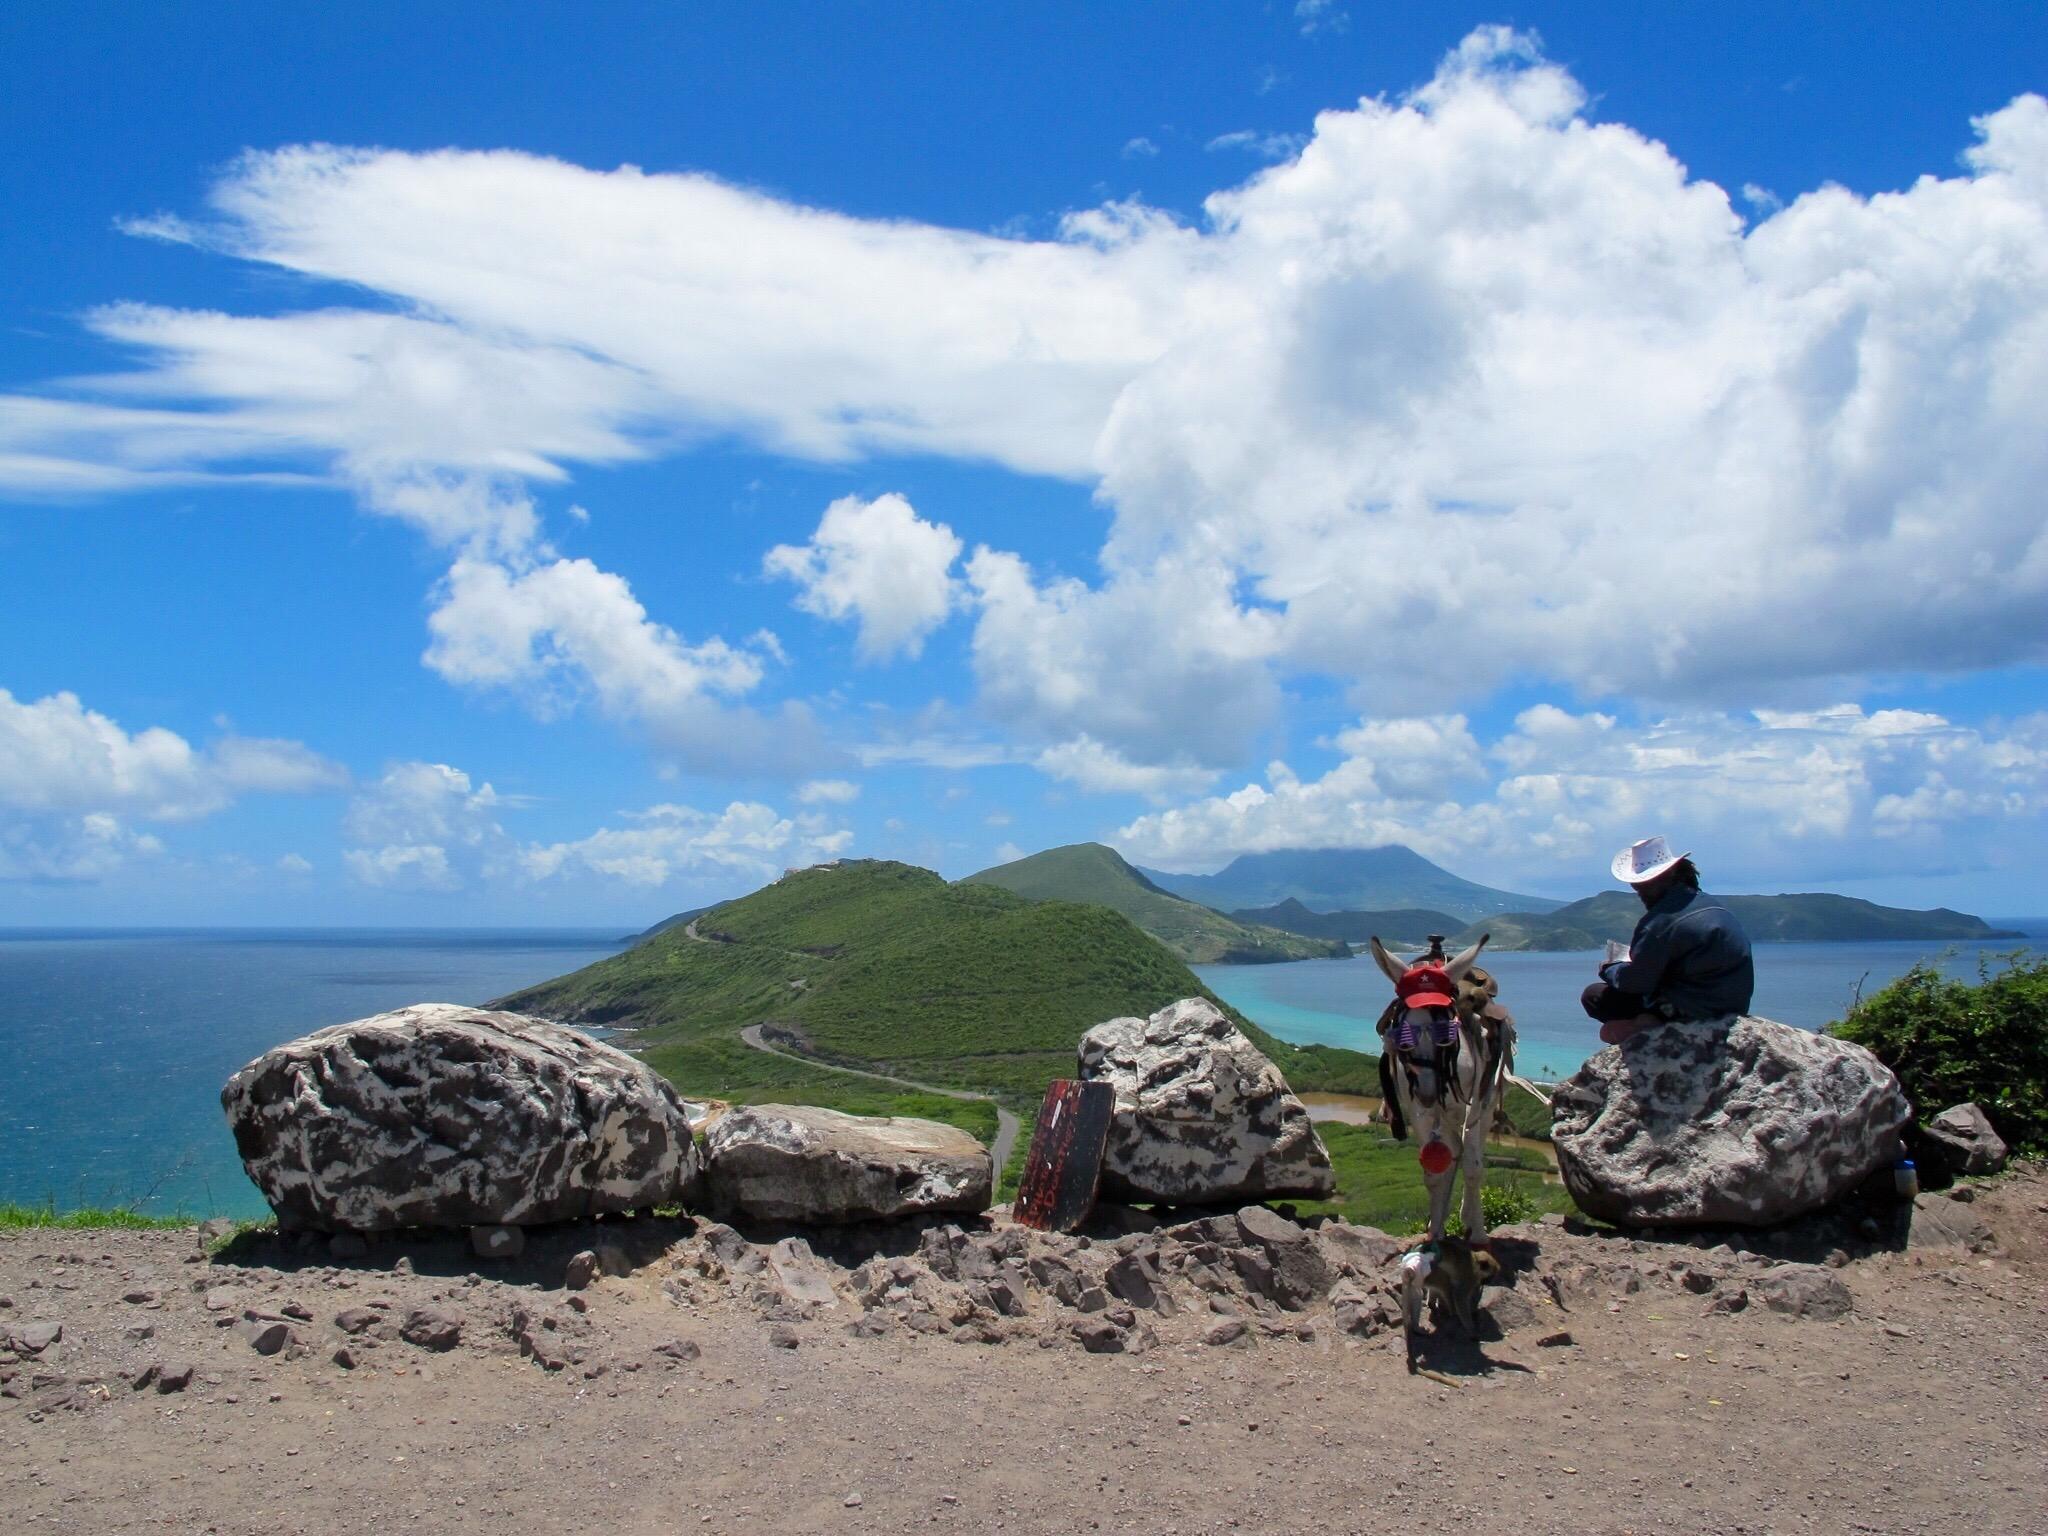 TImothy Hill, St. Kitts, Caribbean